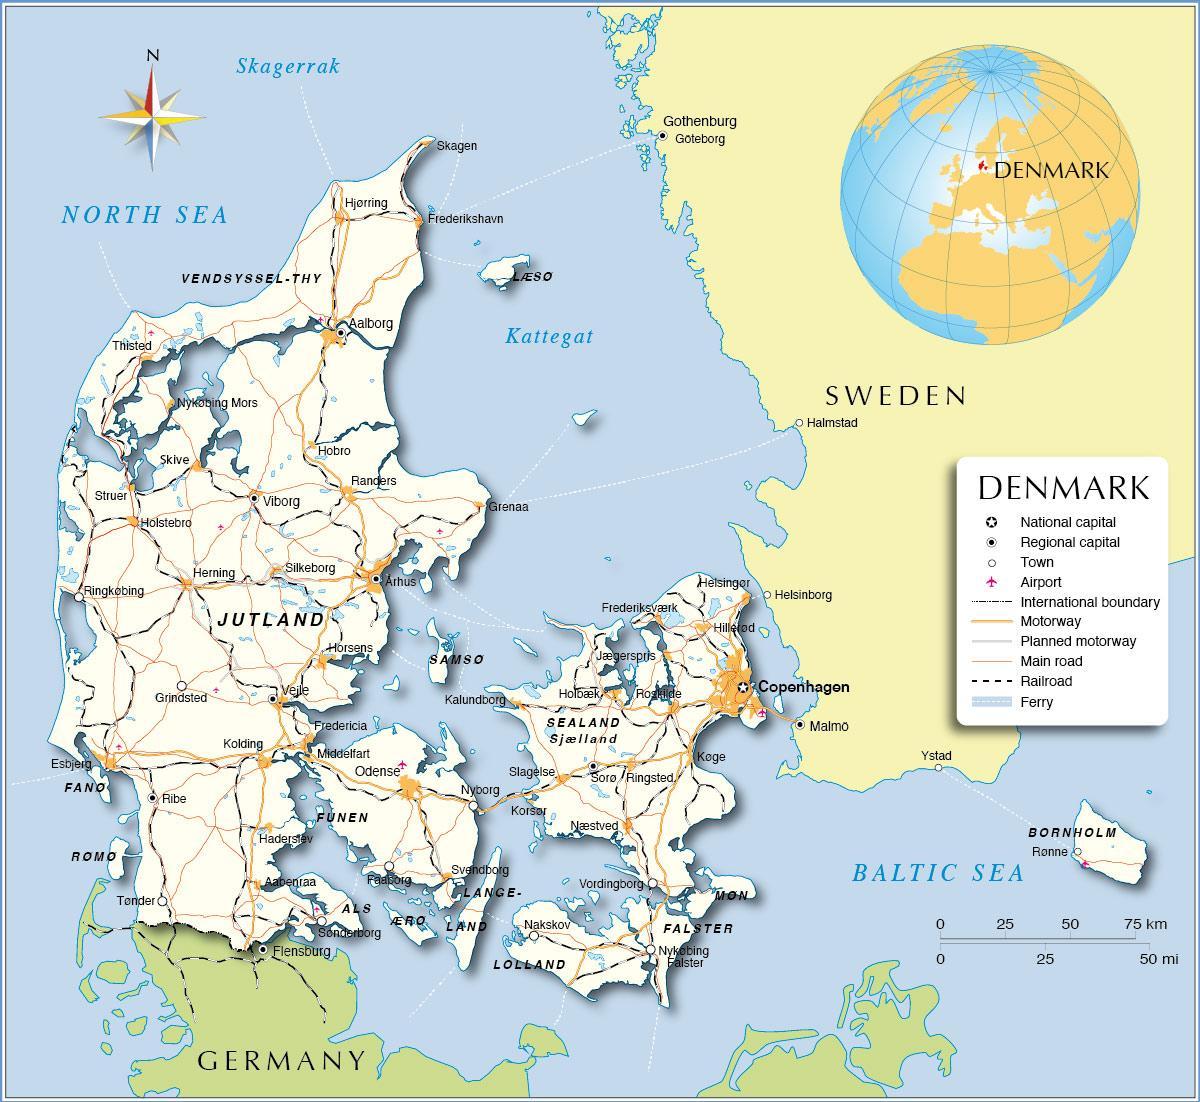 Denmark map - Map over denmark (Northern Europe - Europe) on